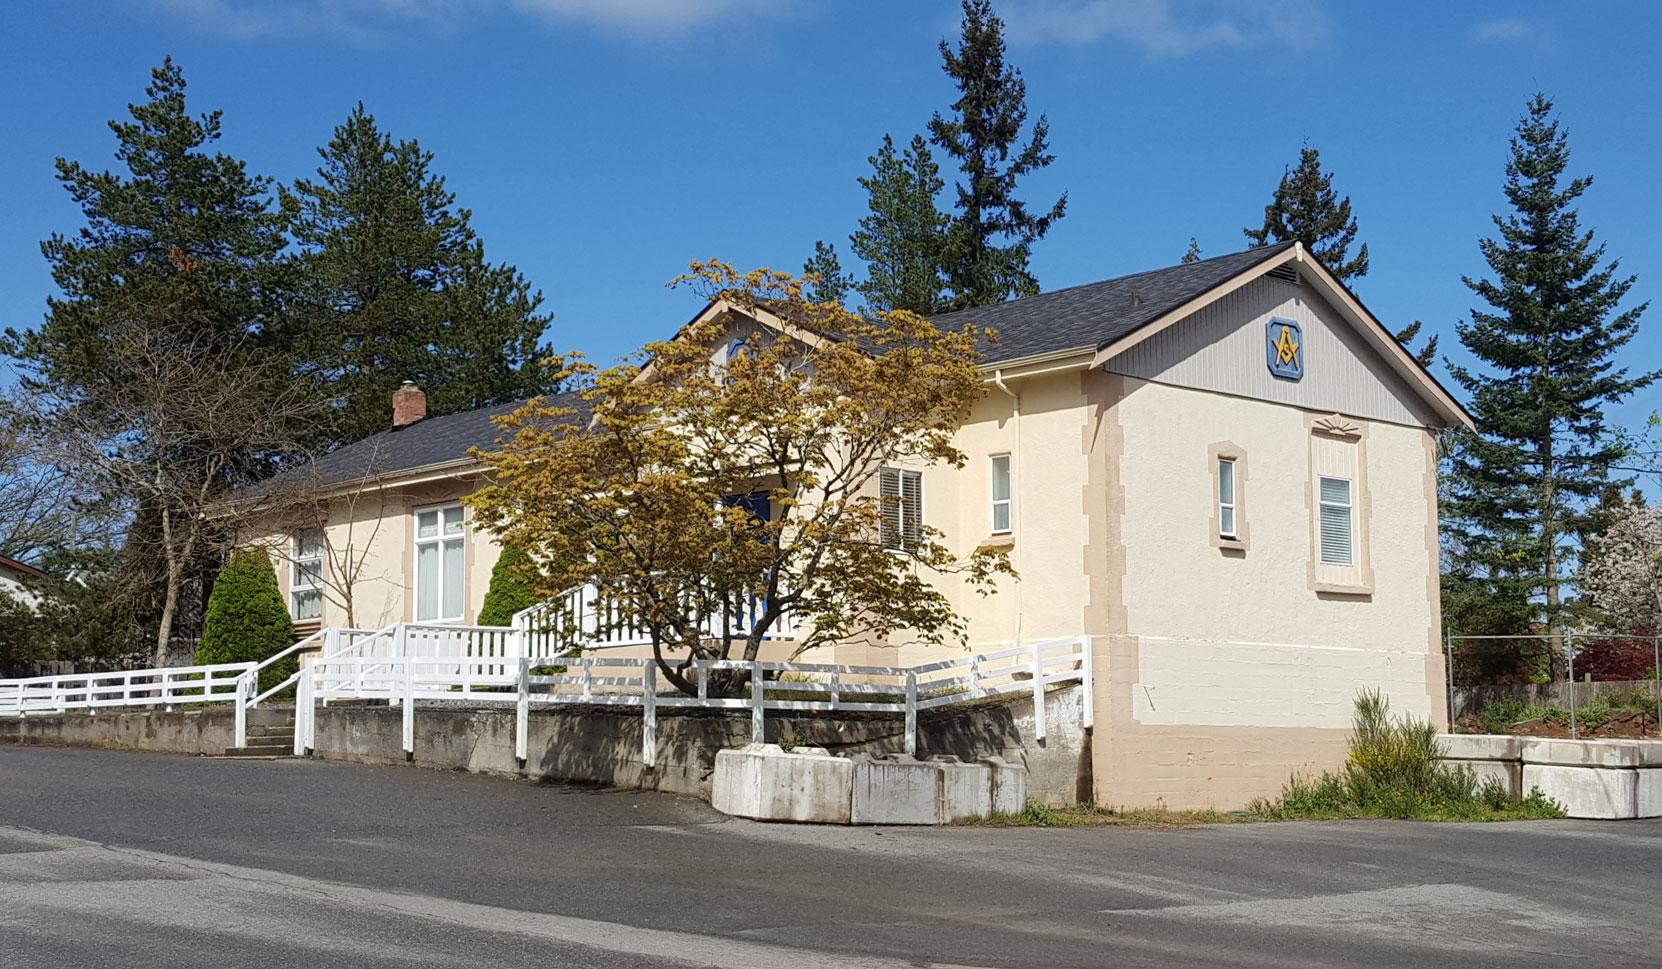 Morpeth Masonic Hall, 620 Morpeth Avenue, Nanaimo, BC (photo: Temple Lodge No. 33 Historian)